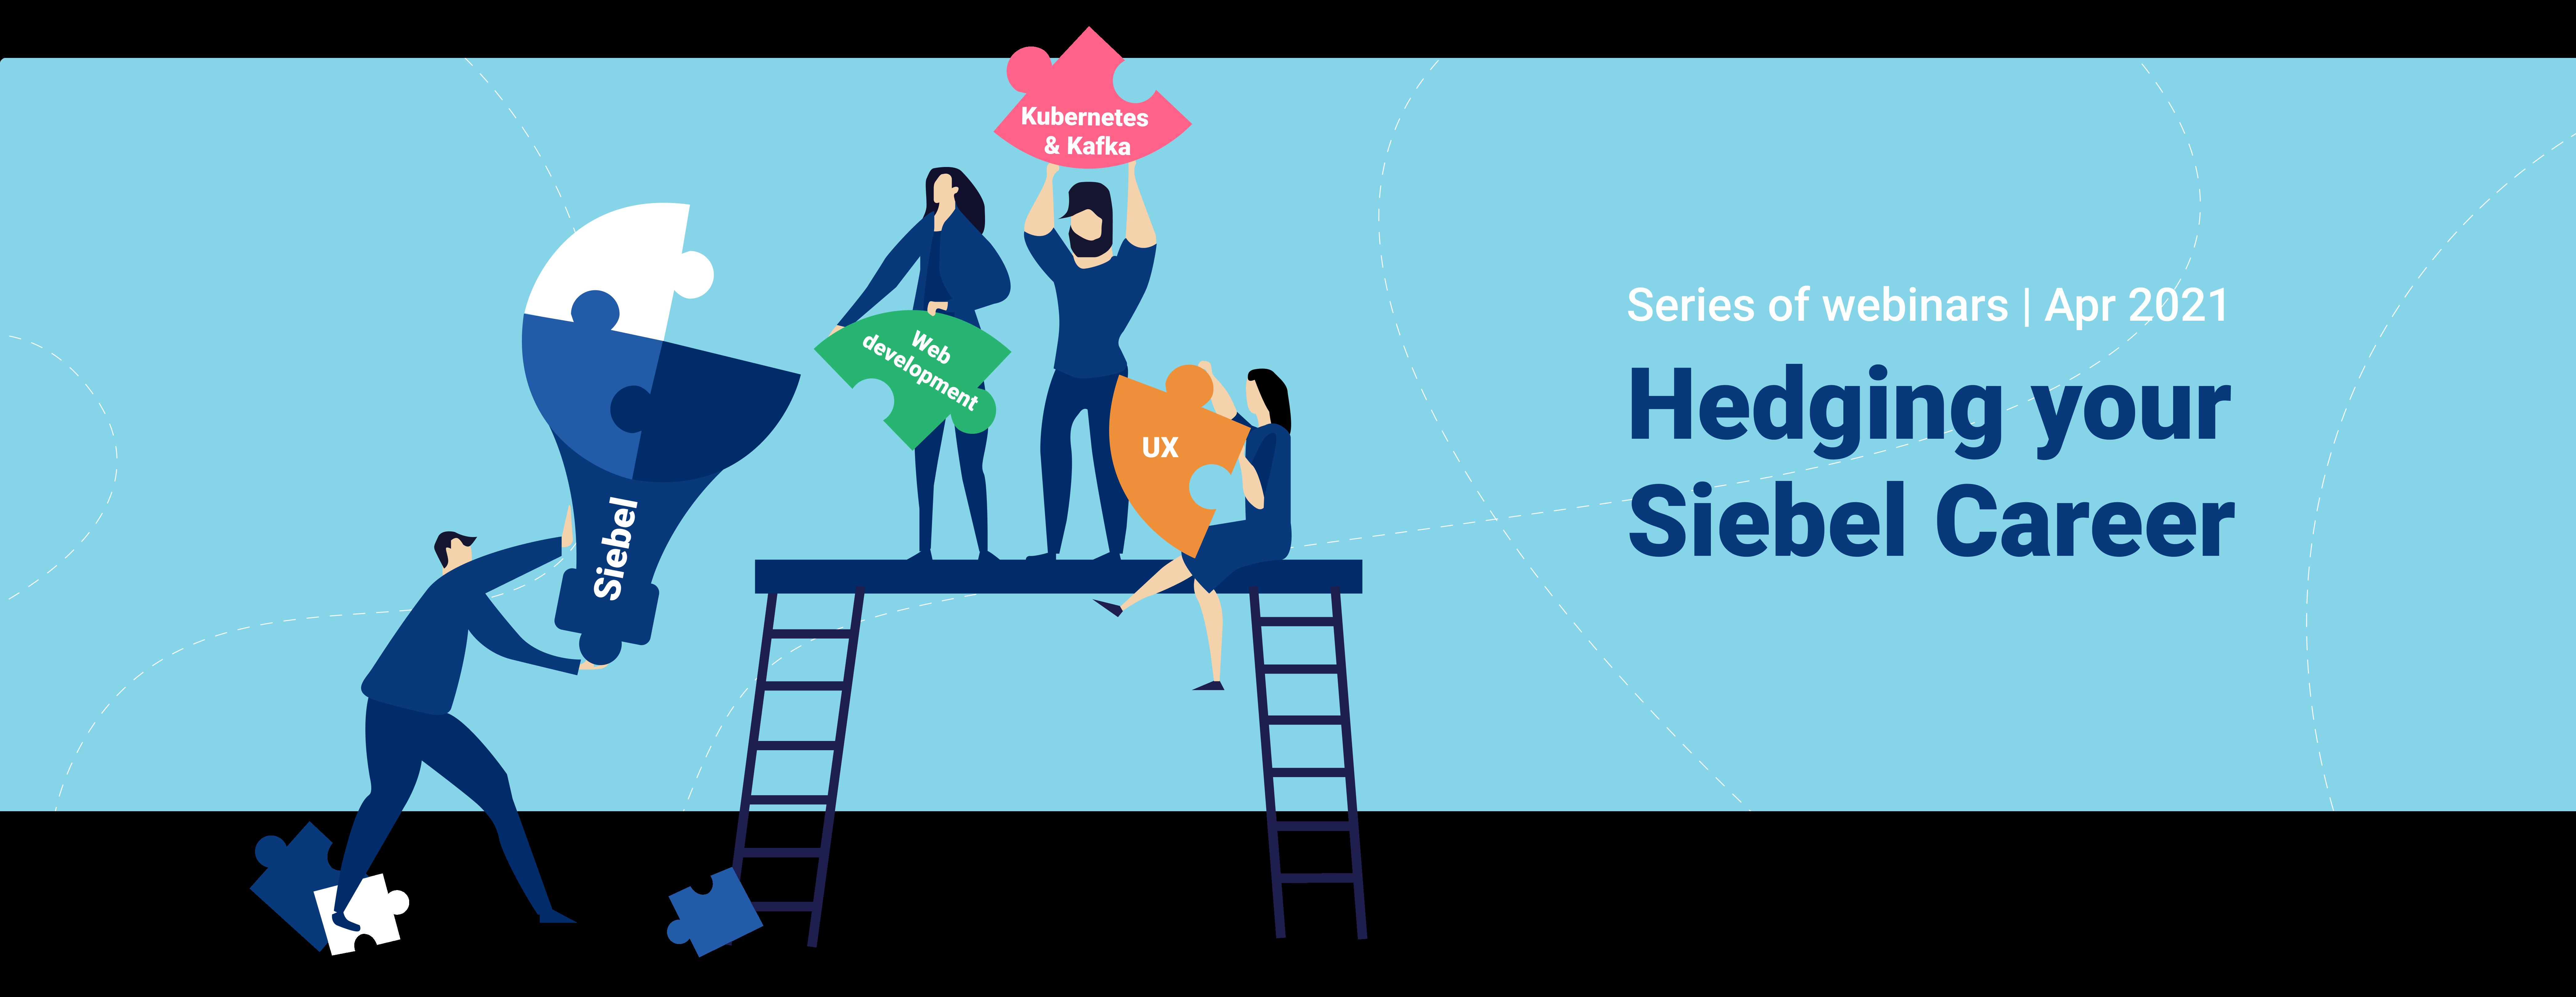 Hedging Your Siebel Career webinars